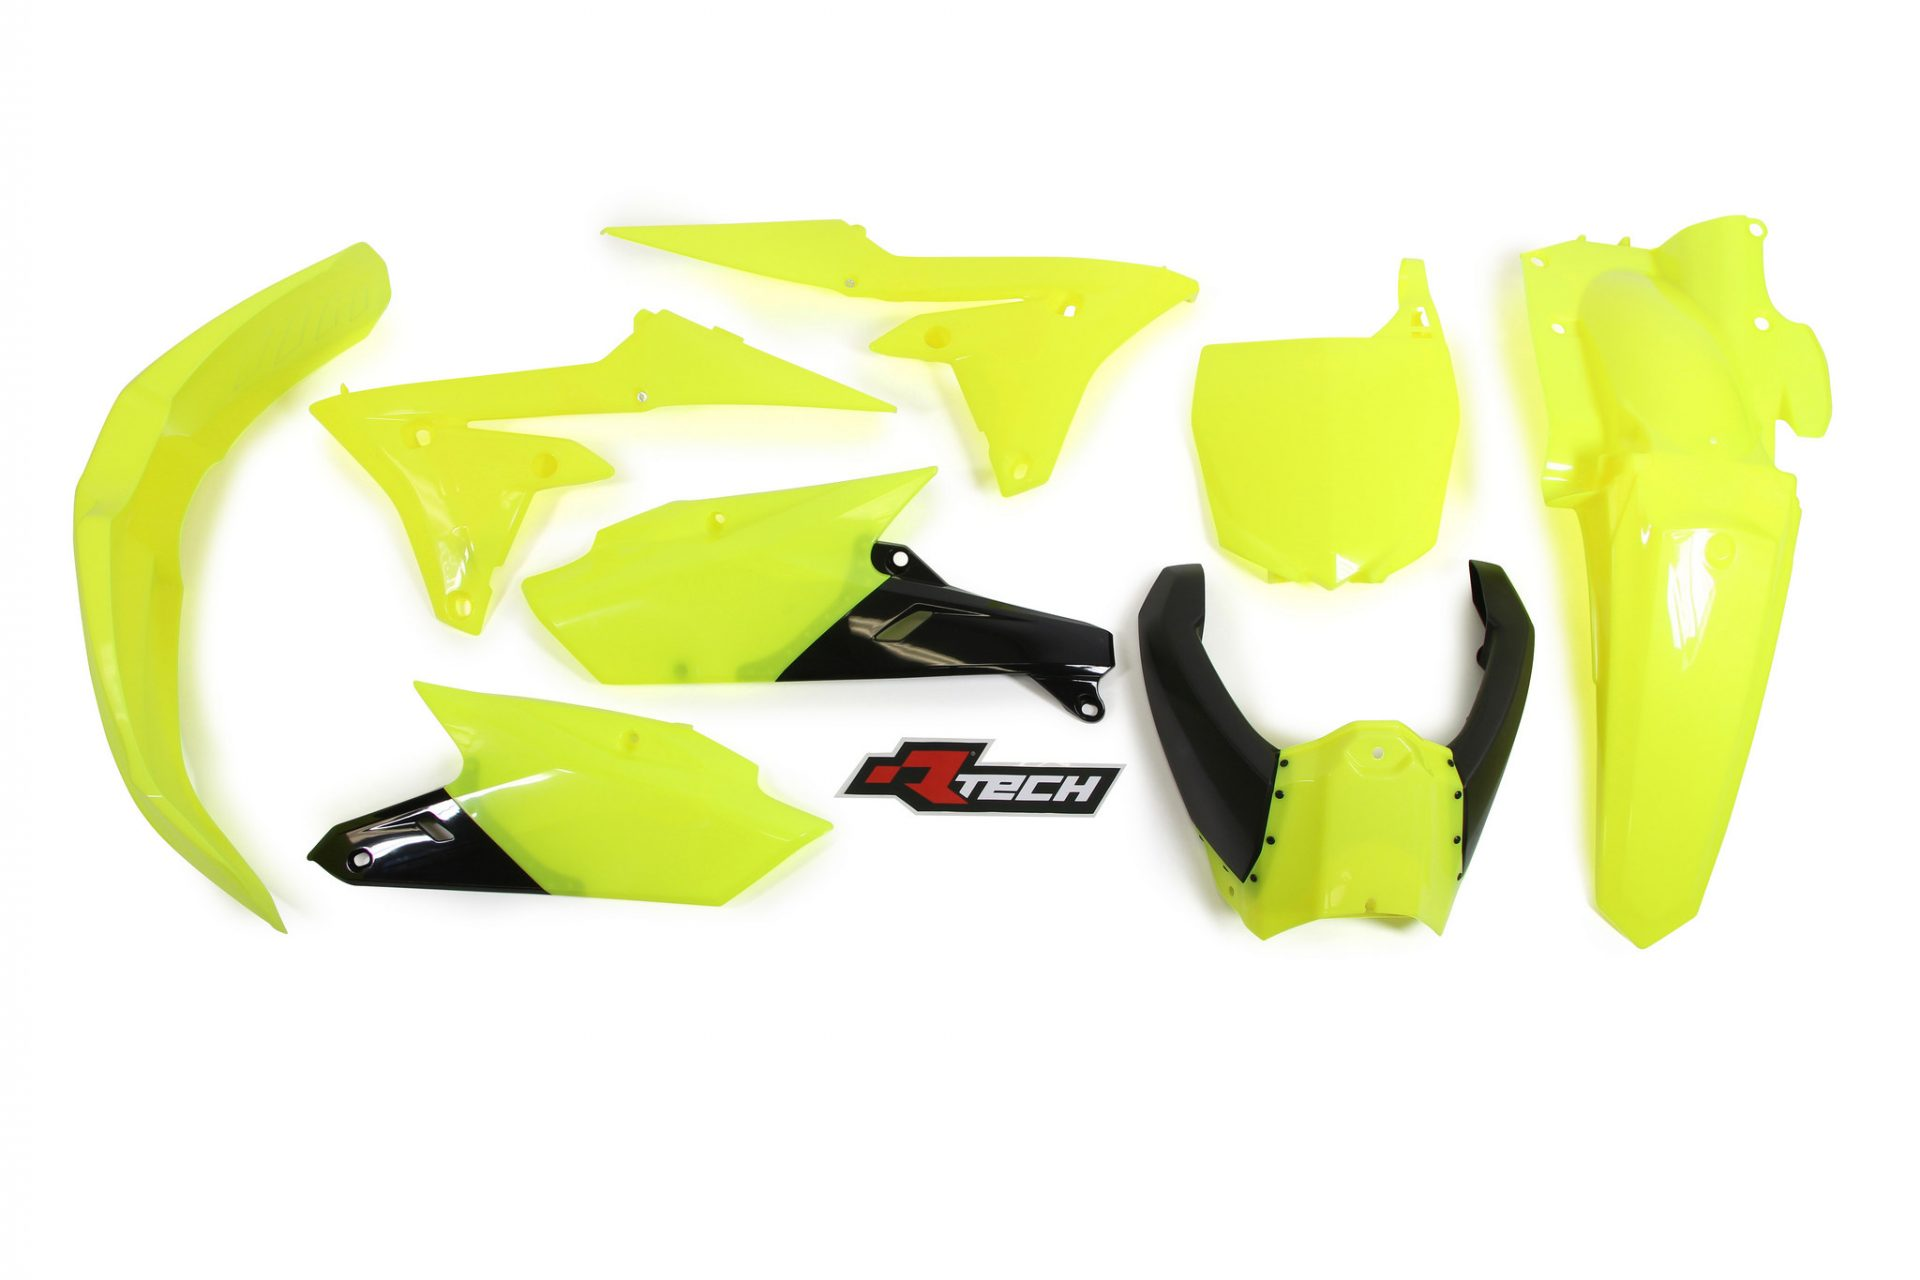 Neon yellow kit rival ink design co custom motocross graphics - Rtech Neon Yellow